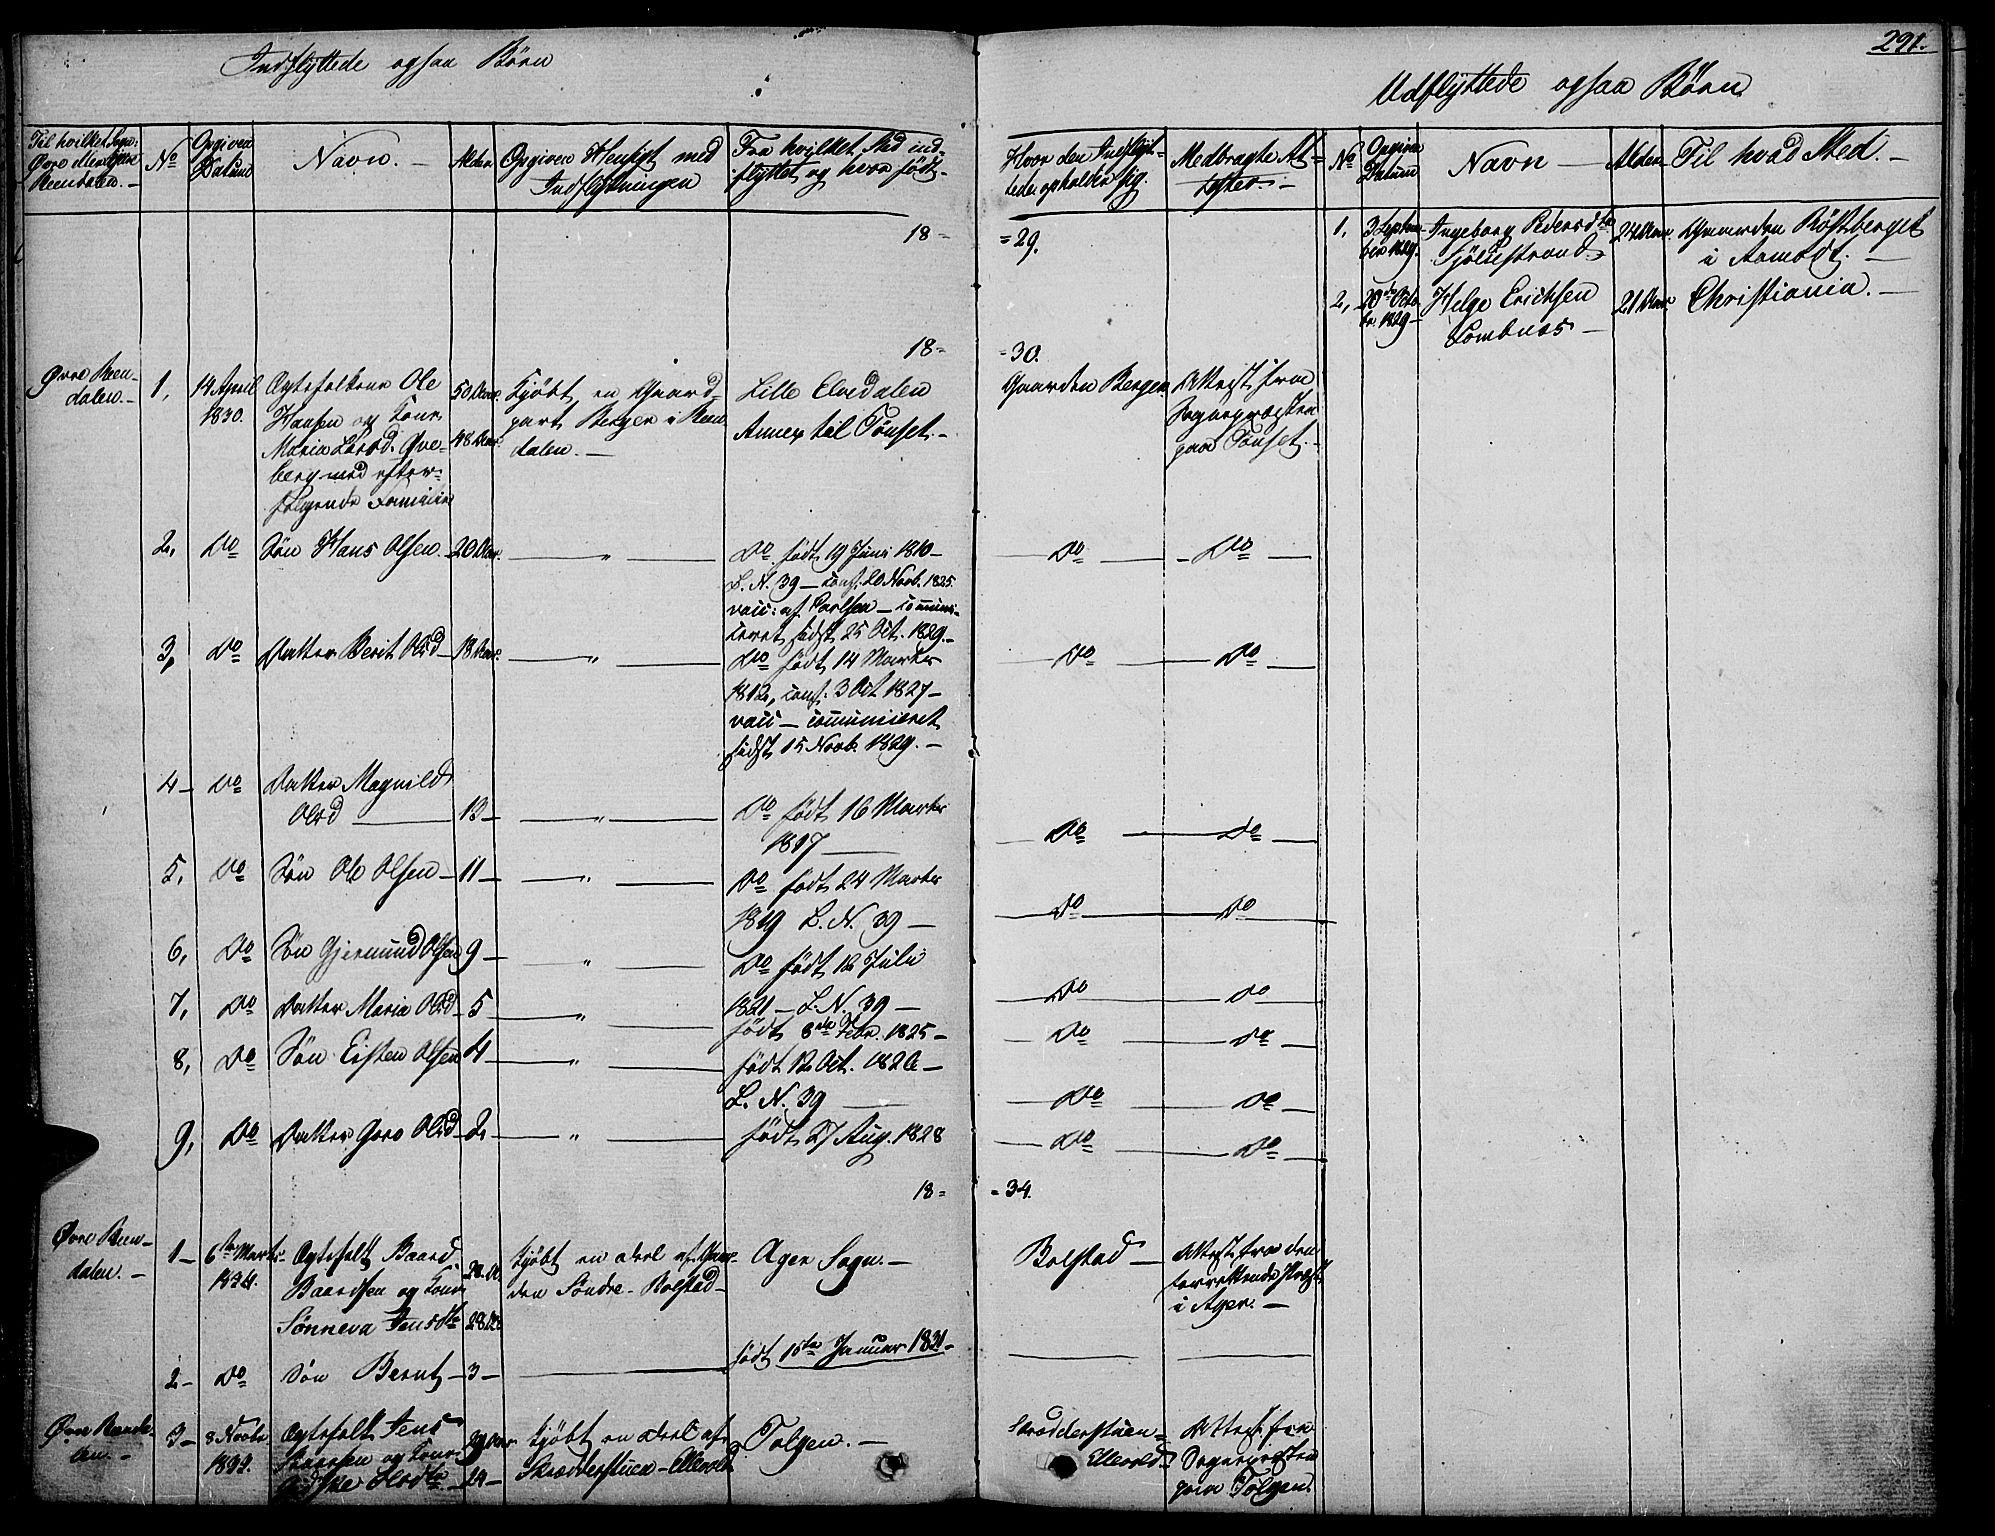 SAH, Rendalen prestekontor, H/Ha/Haa/L0004: Ministerialbok nr. 4, 1829-1852, s. 291